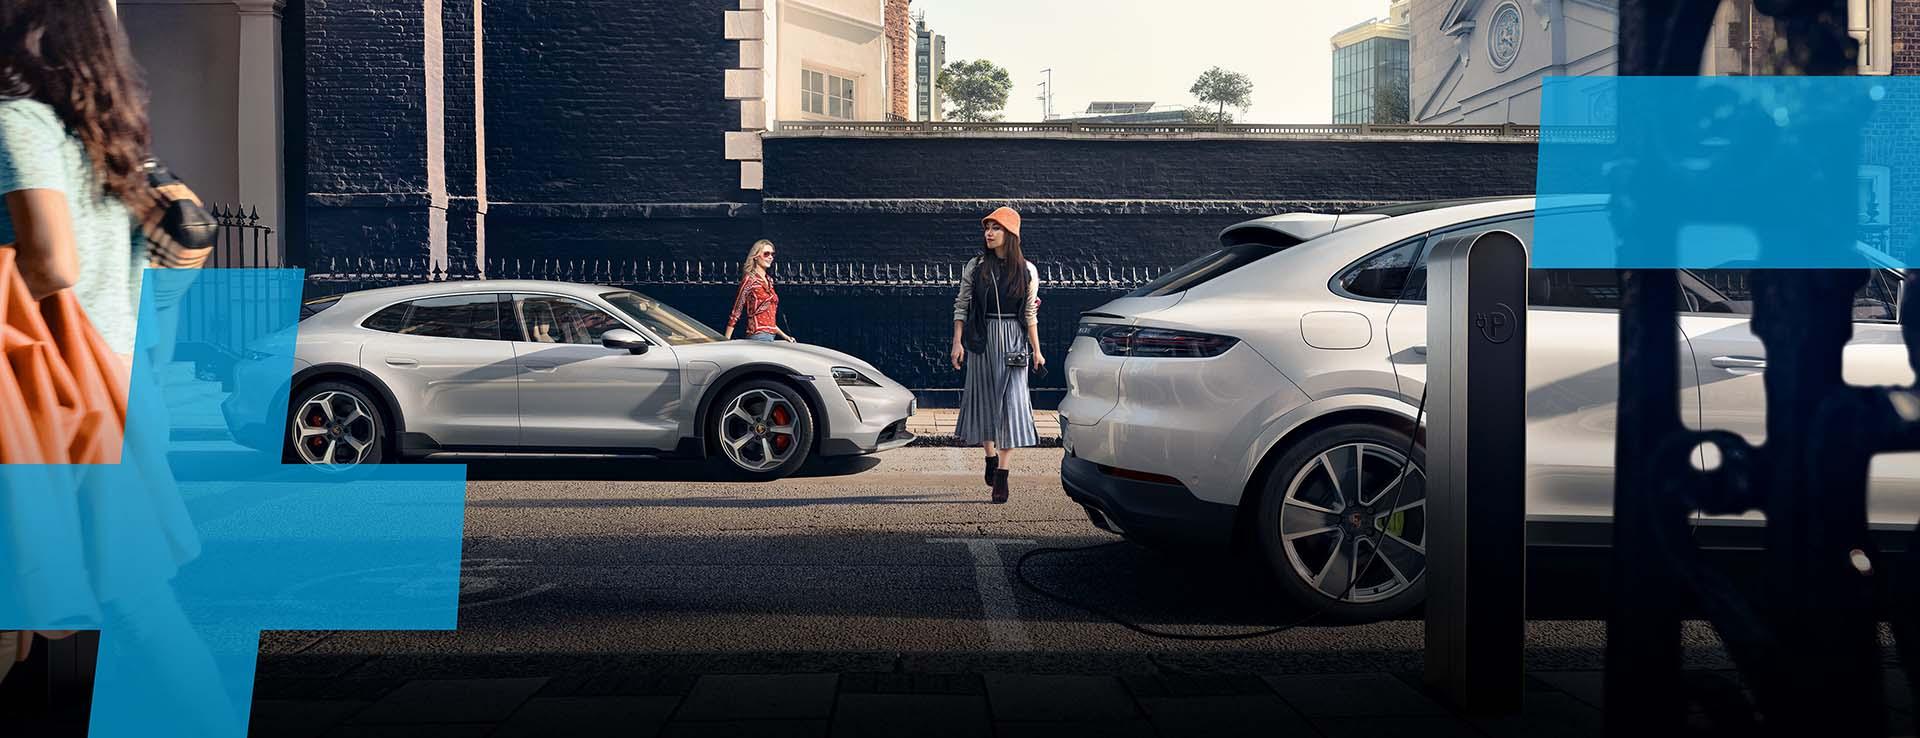 Performans, elektriklendi. - Porsche E-Performans.